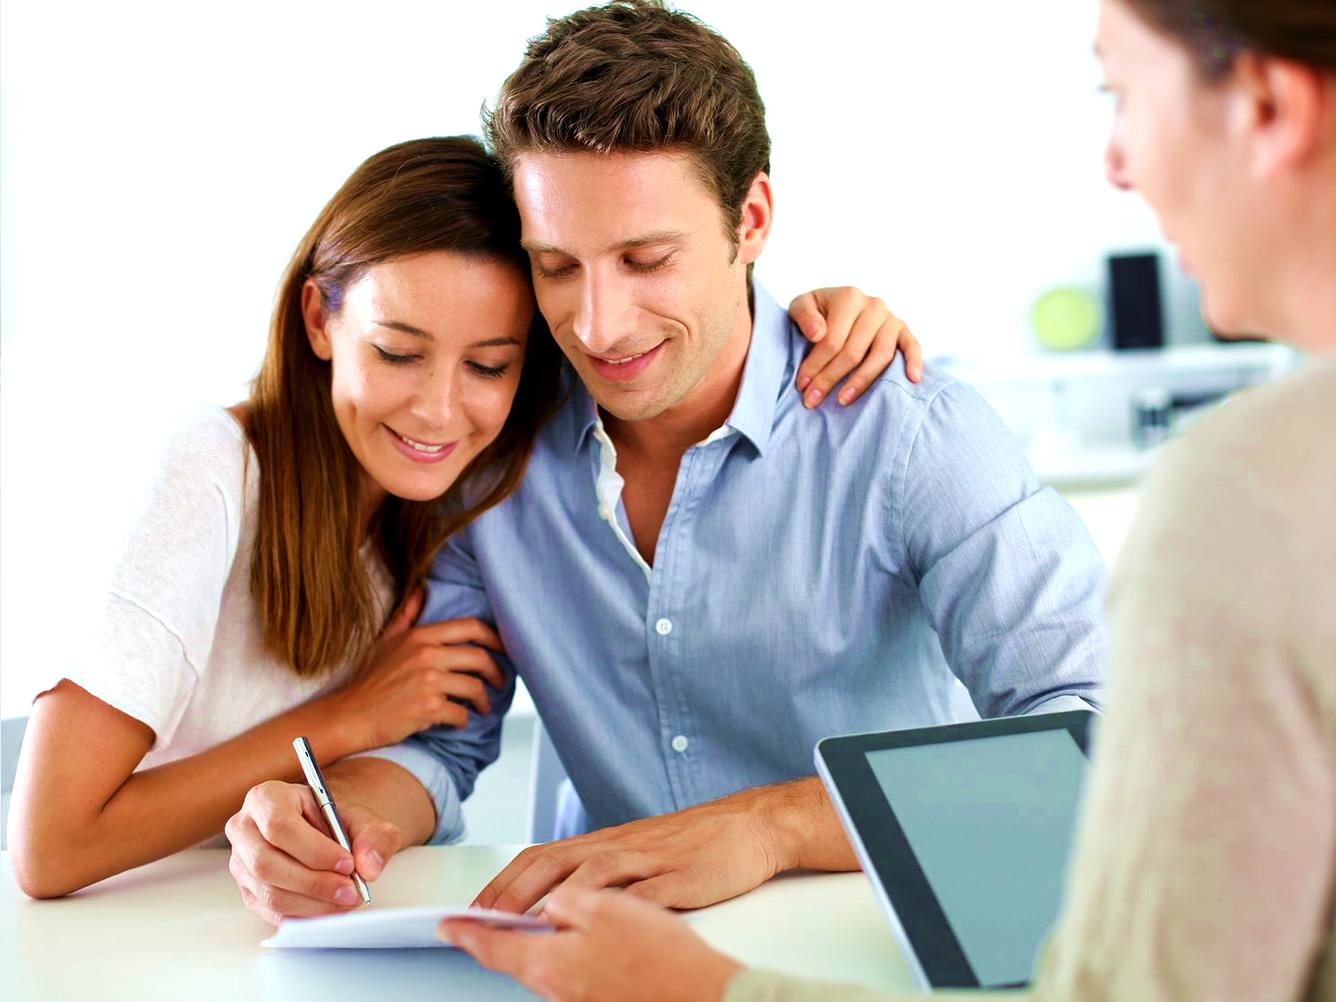 Cuidados para ter antes de assinar o contrato de compra de imóvel